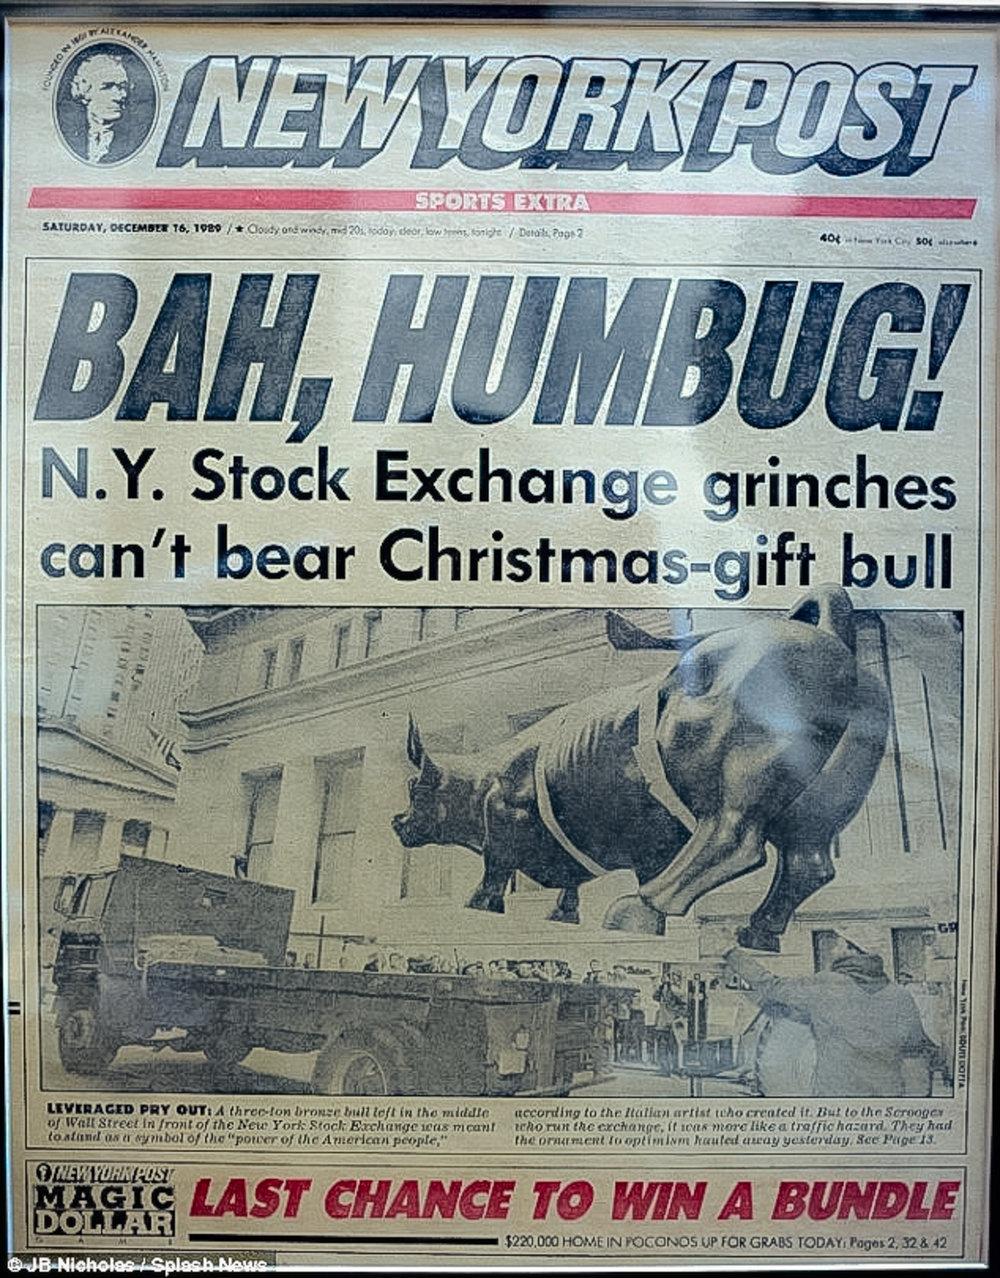 NEW YORK POST'S DECEMBER 16, 1989 ISSUE